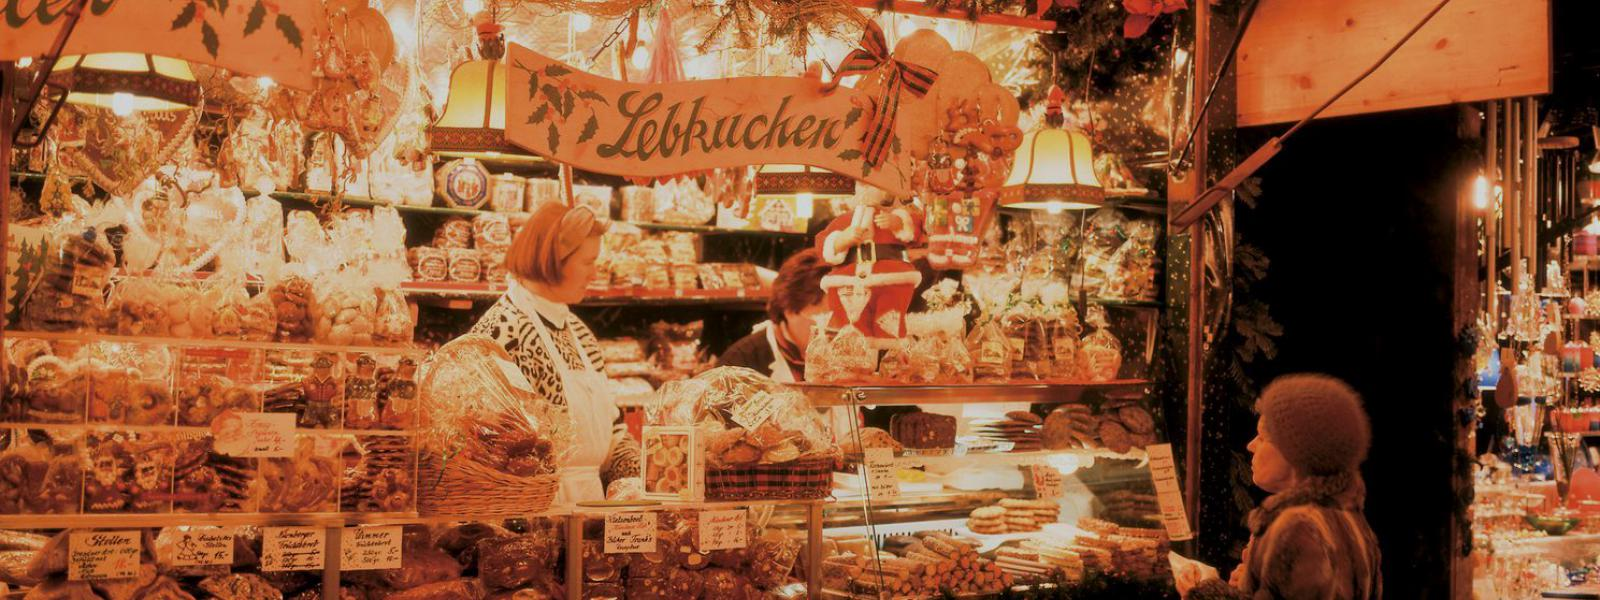 kerstmarkt München